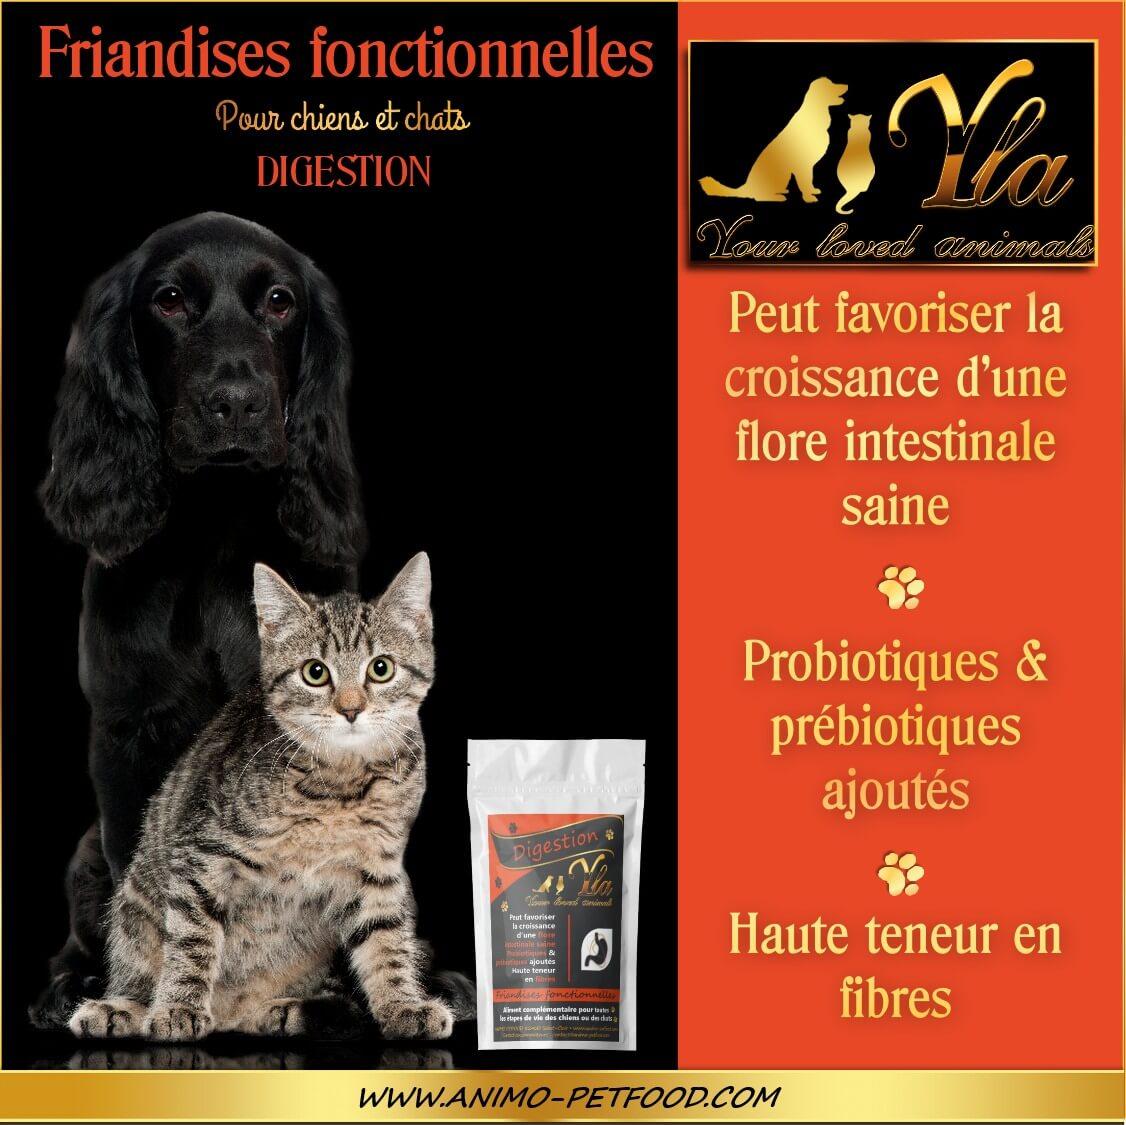 friandise-pour-chien-chat-digestion